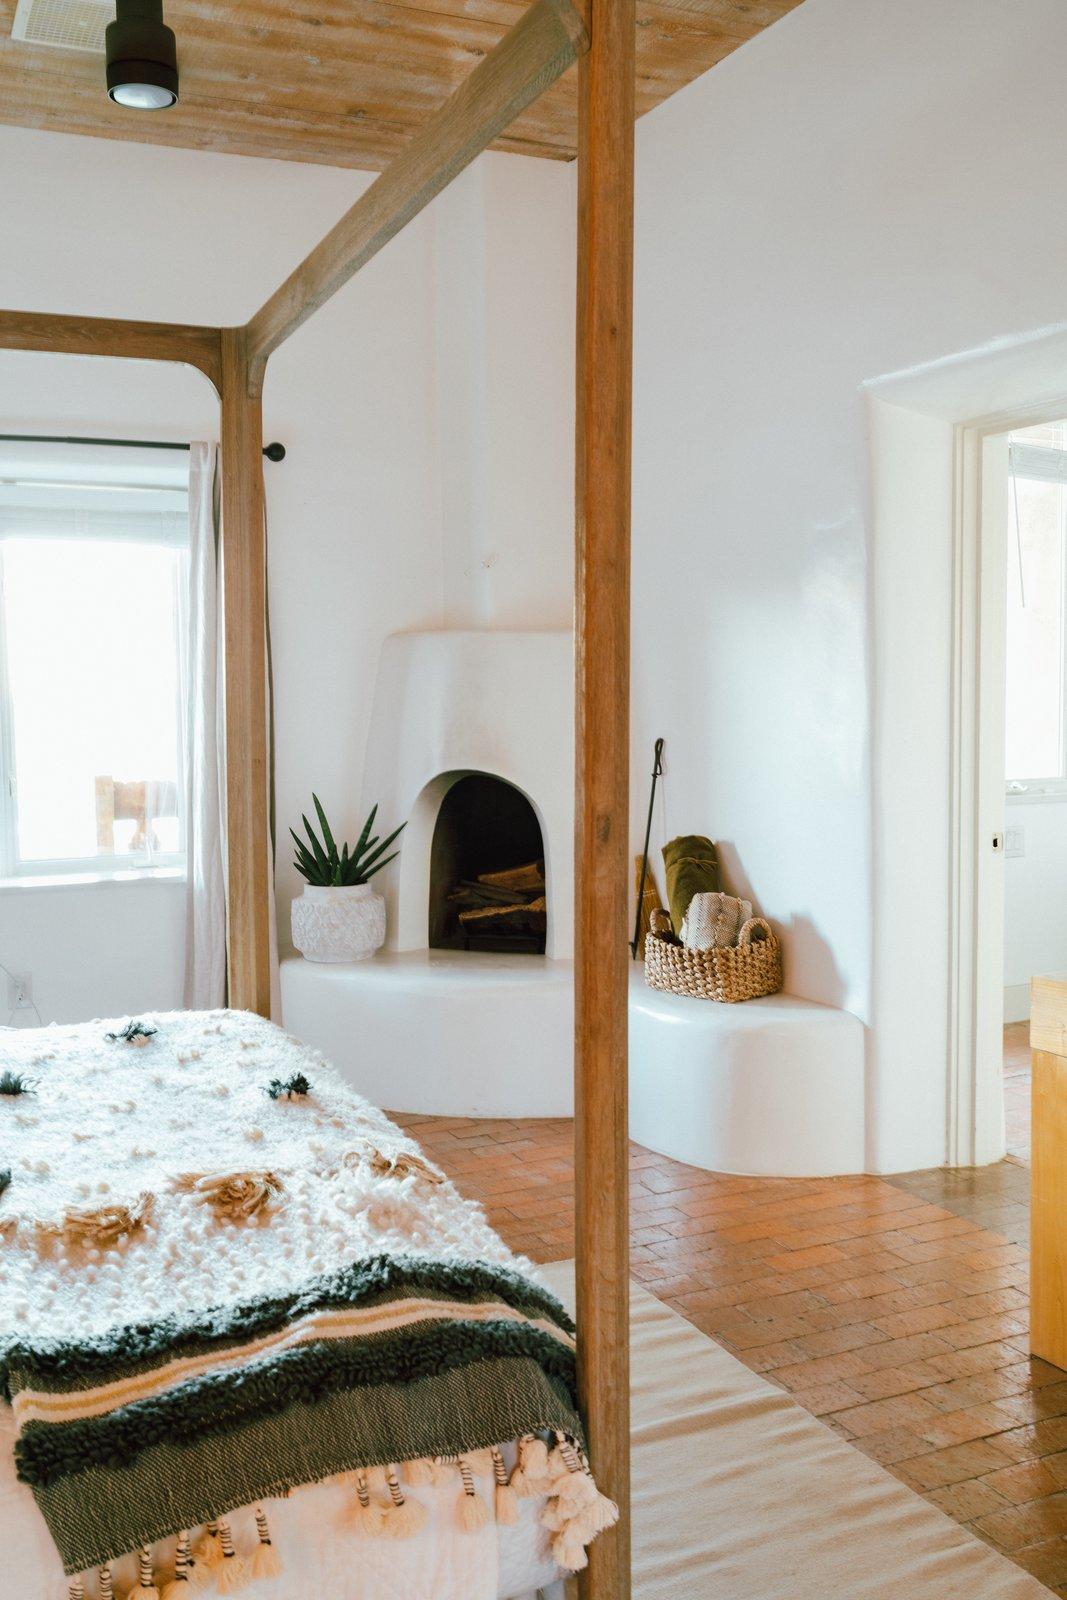 Melissa Young desert hacienda master bedroom with kiva fireplace